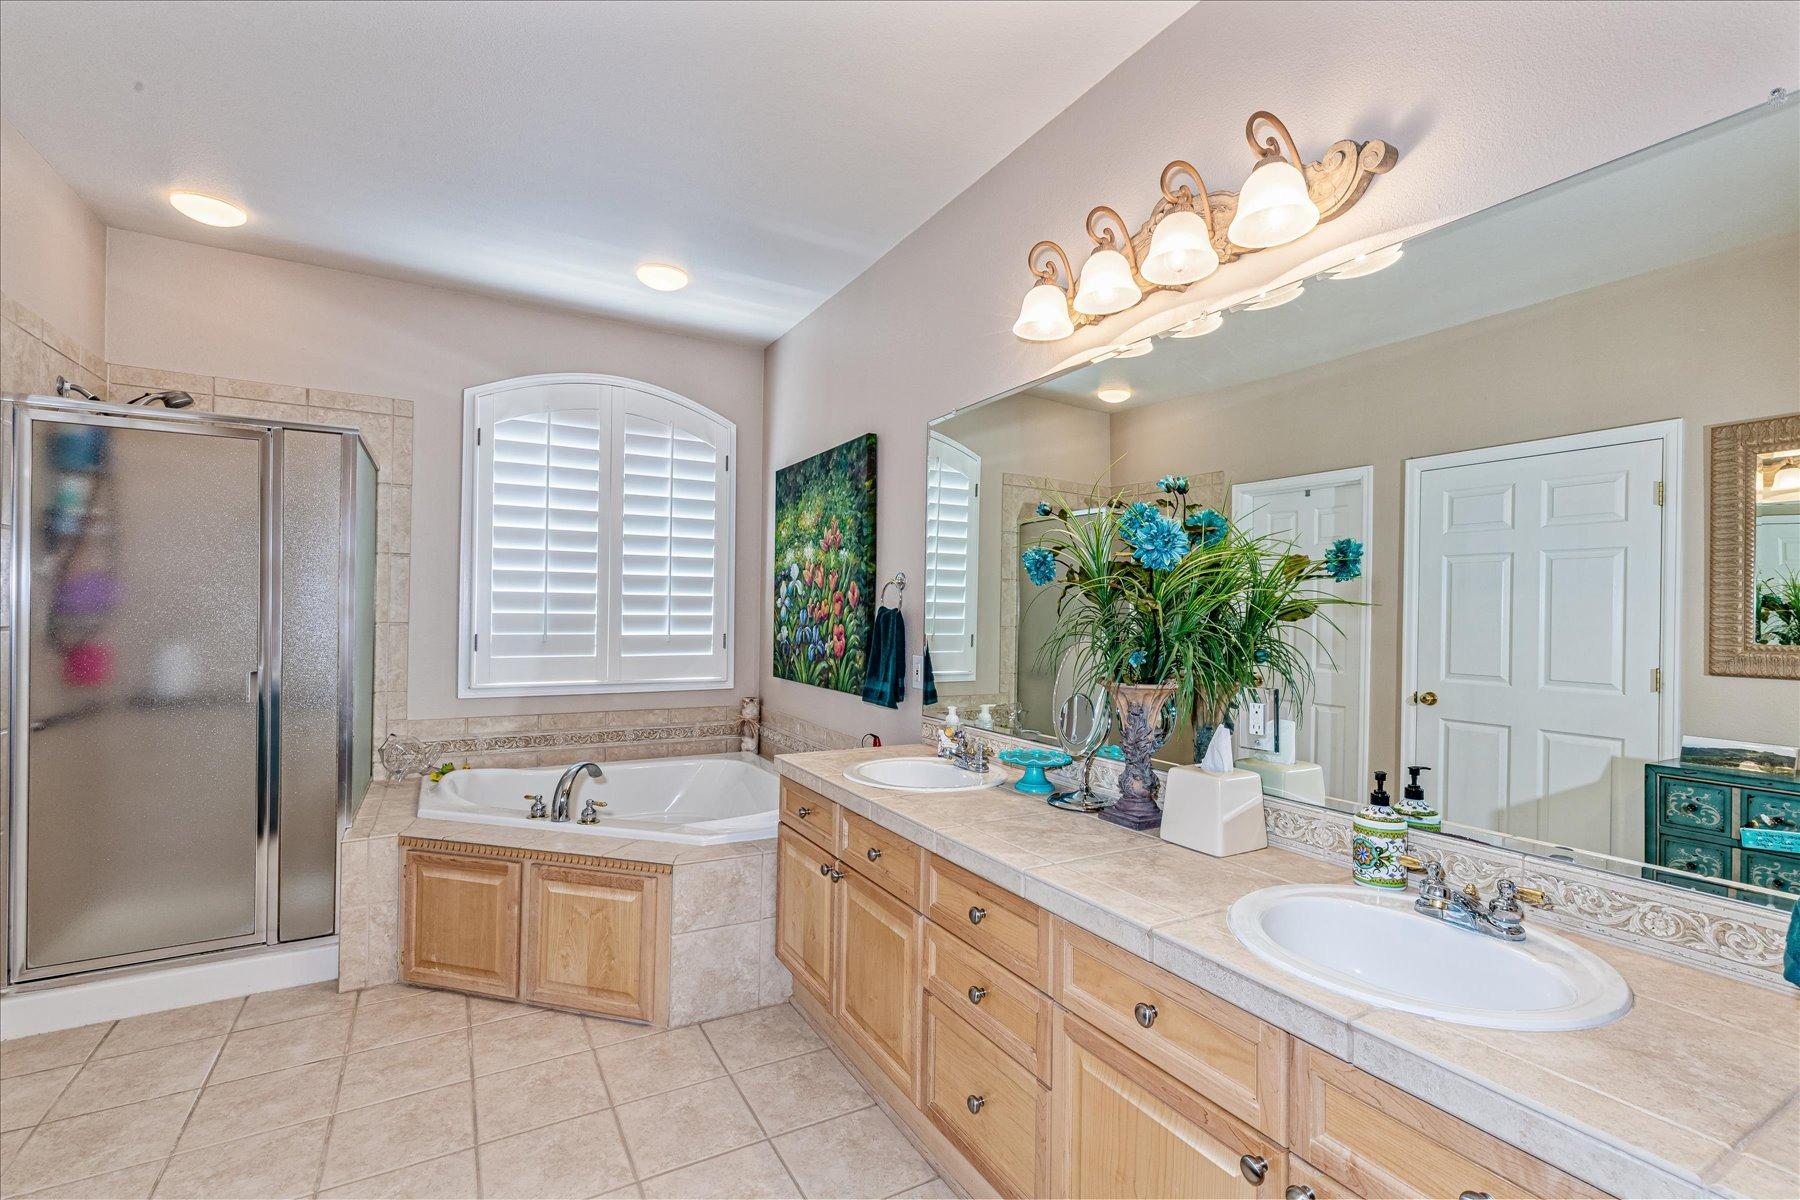 Large 5-pc Tiled Master Bath + Dual Large Closets